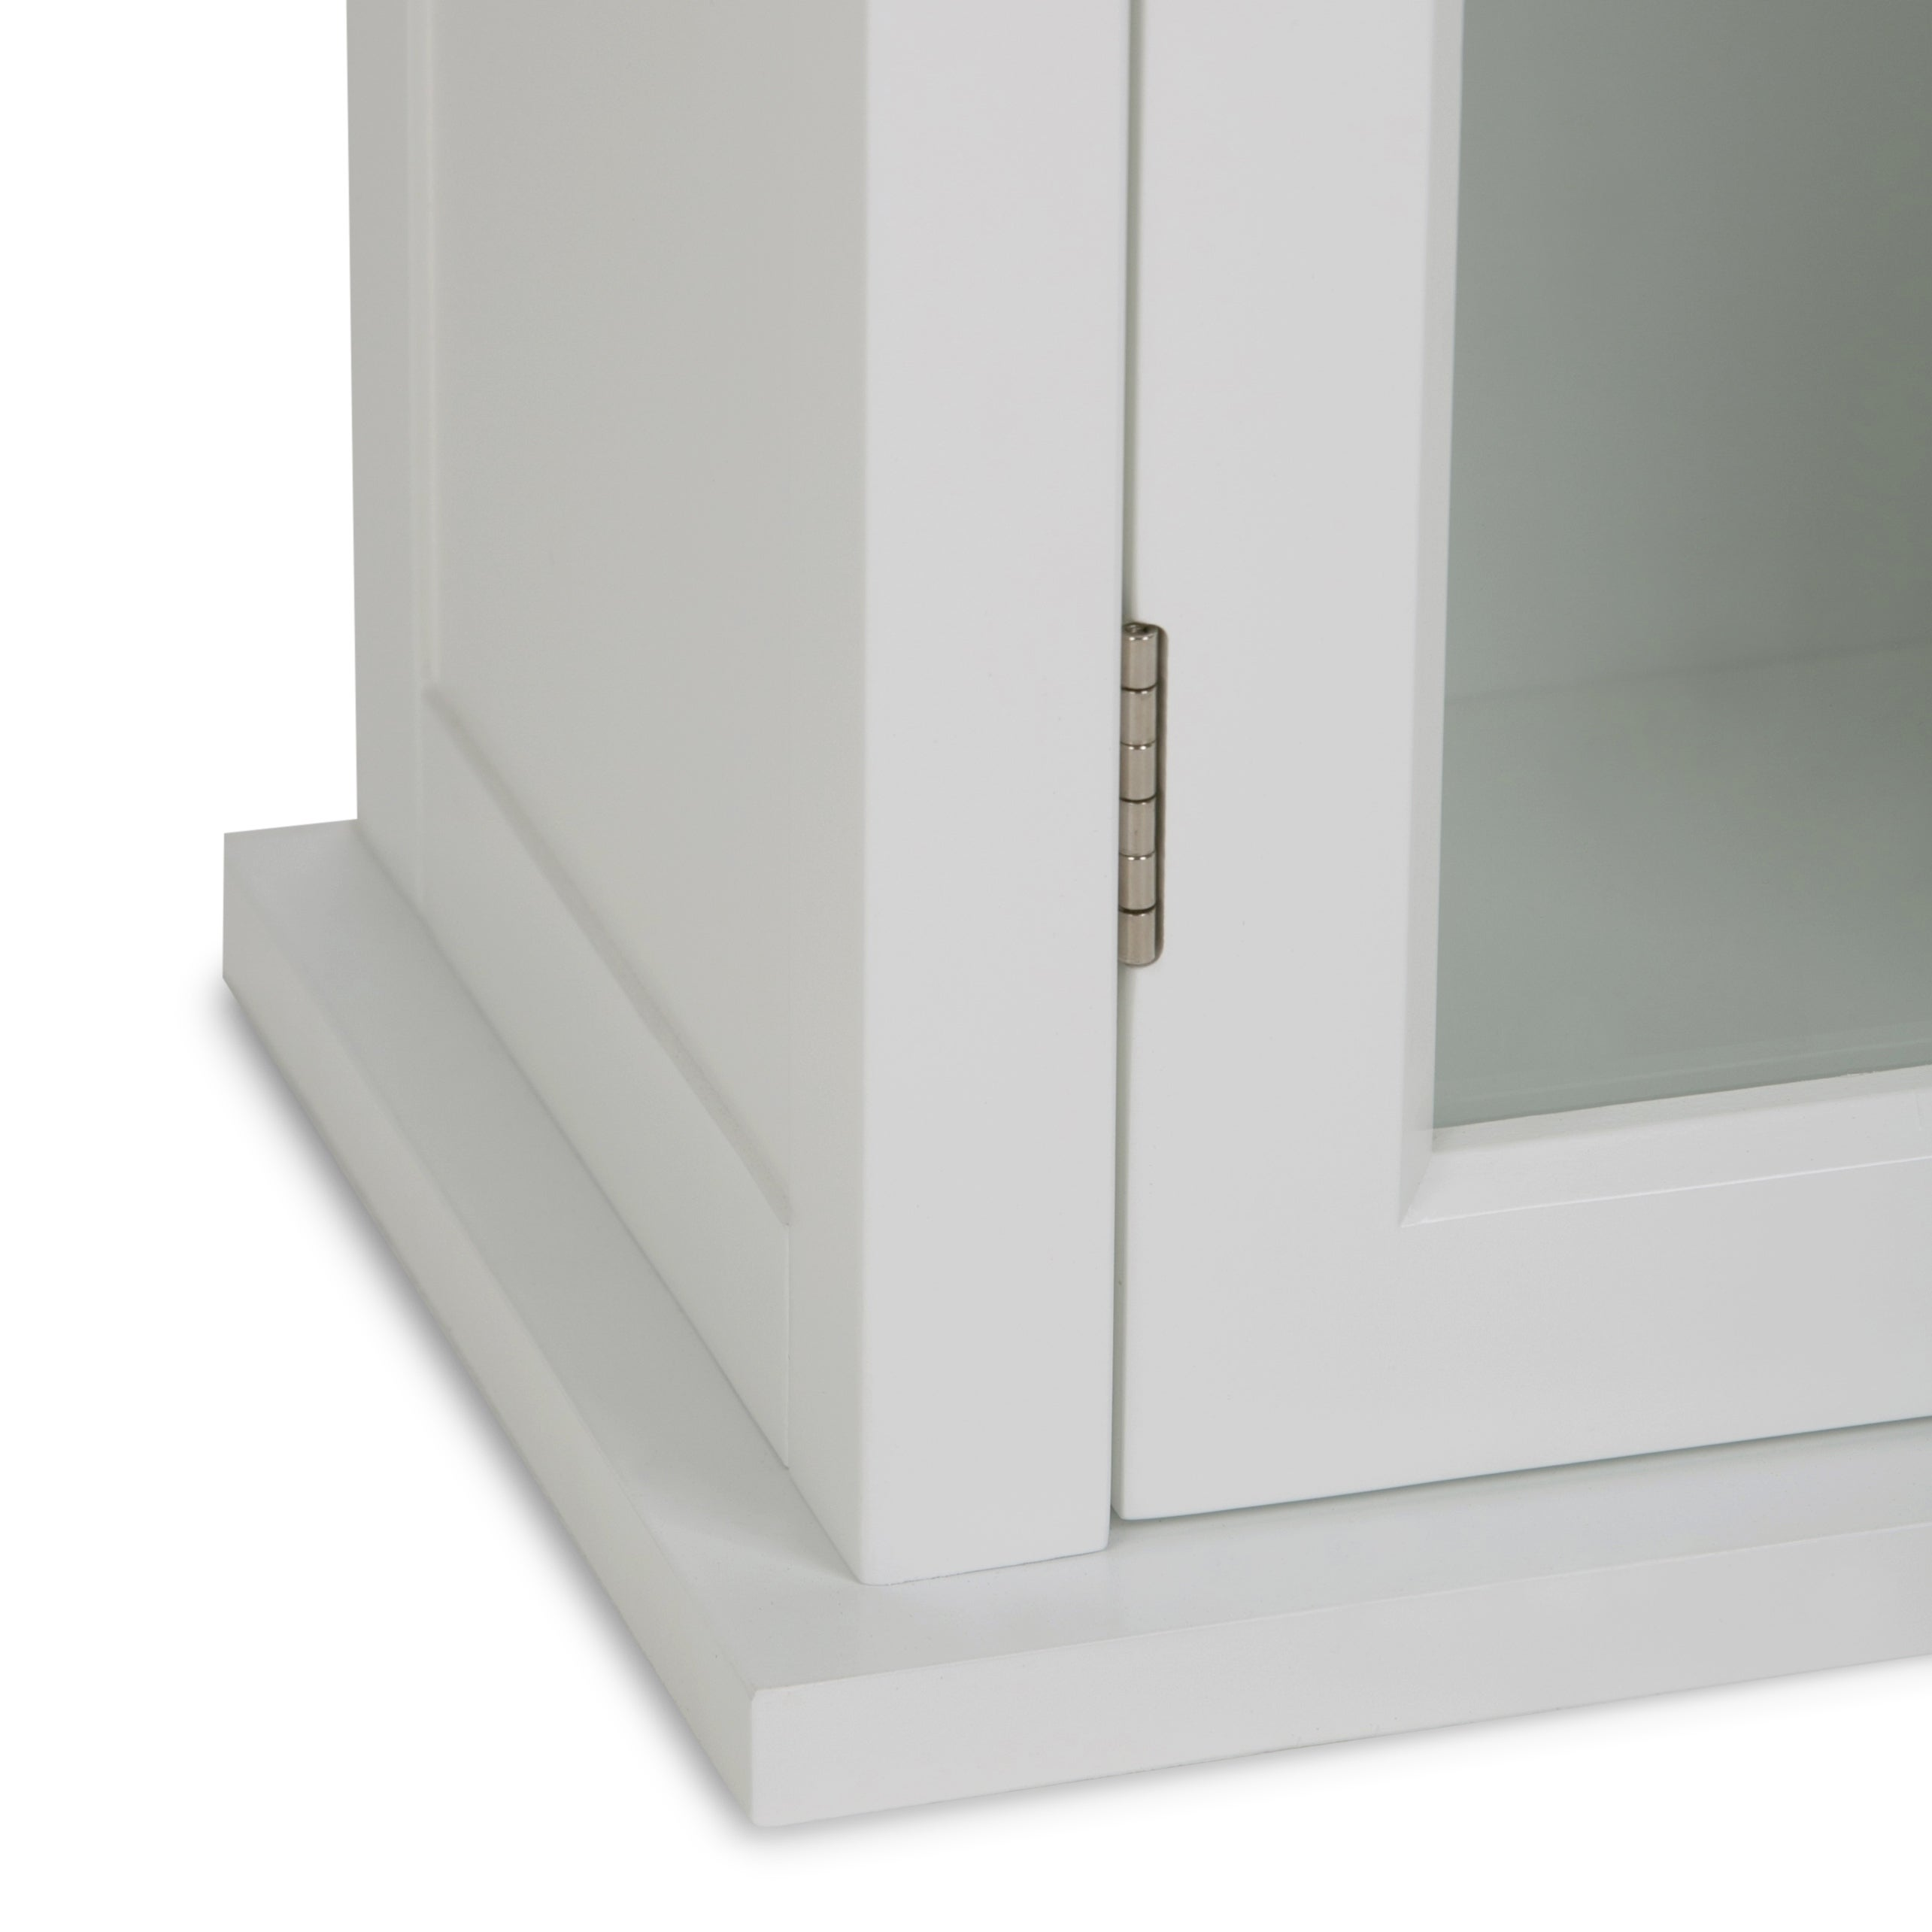 WyndenHall Hayes White Single door Bathroom Wall Cabinet Free